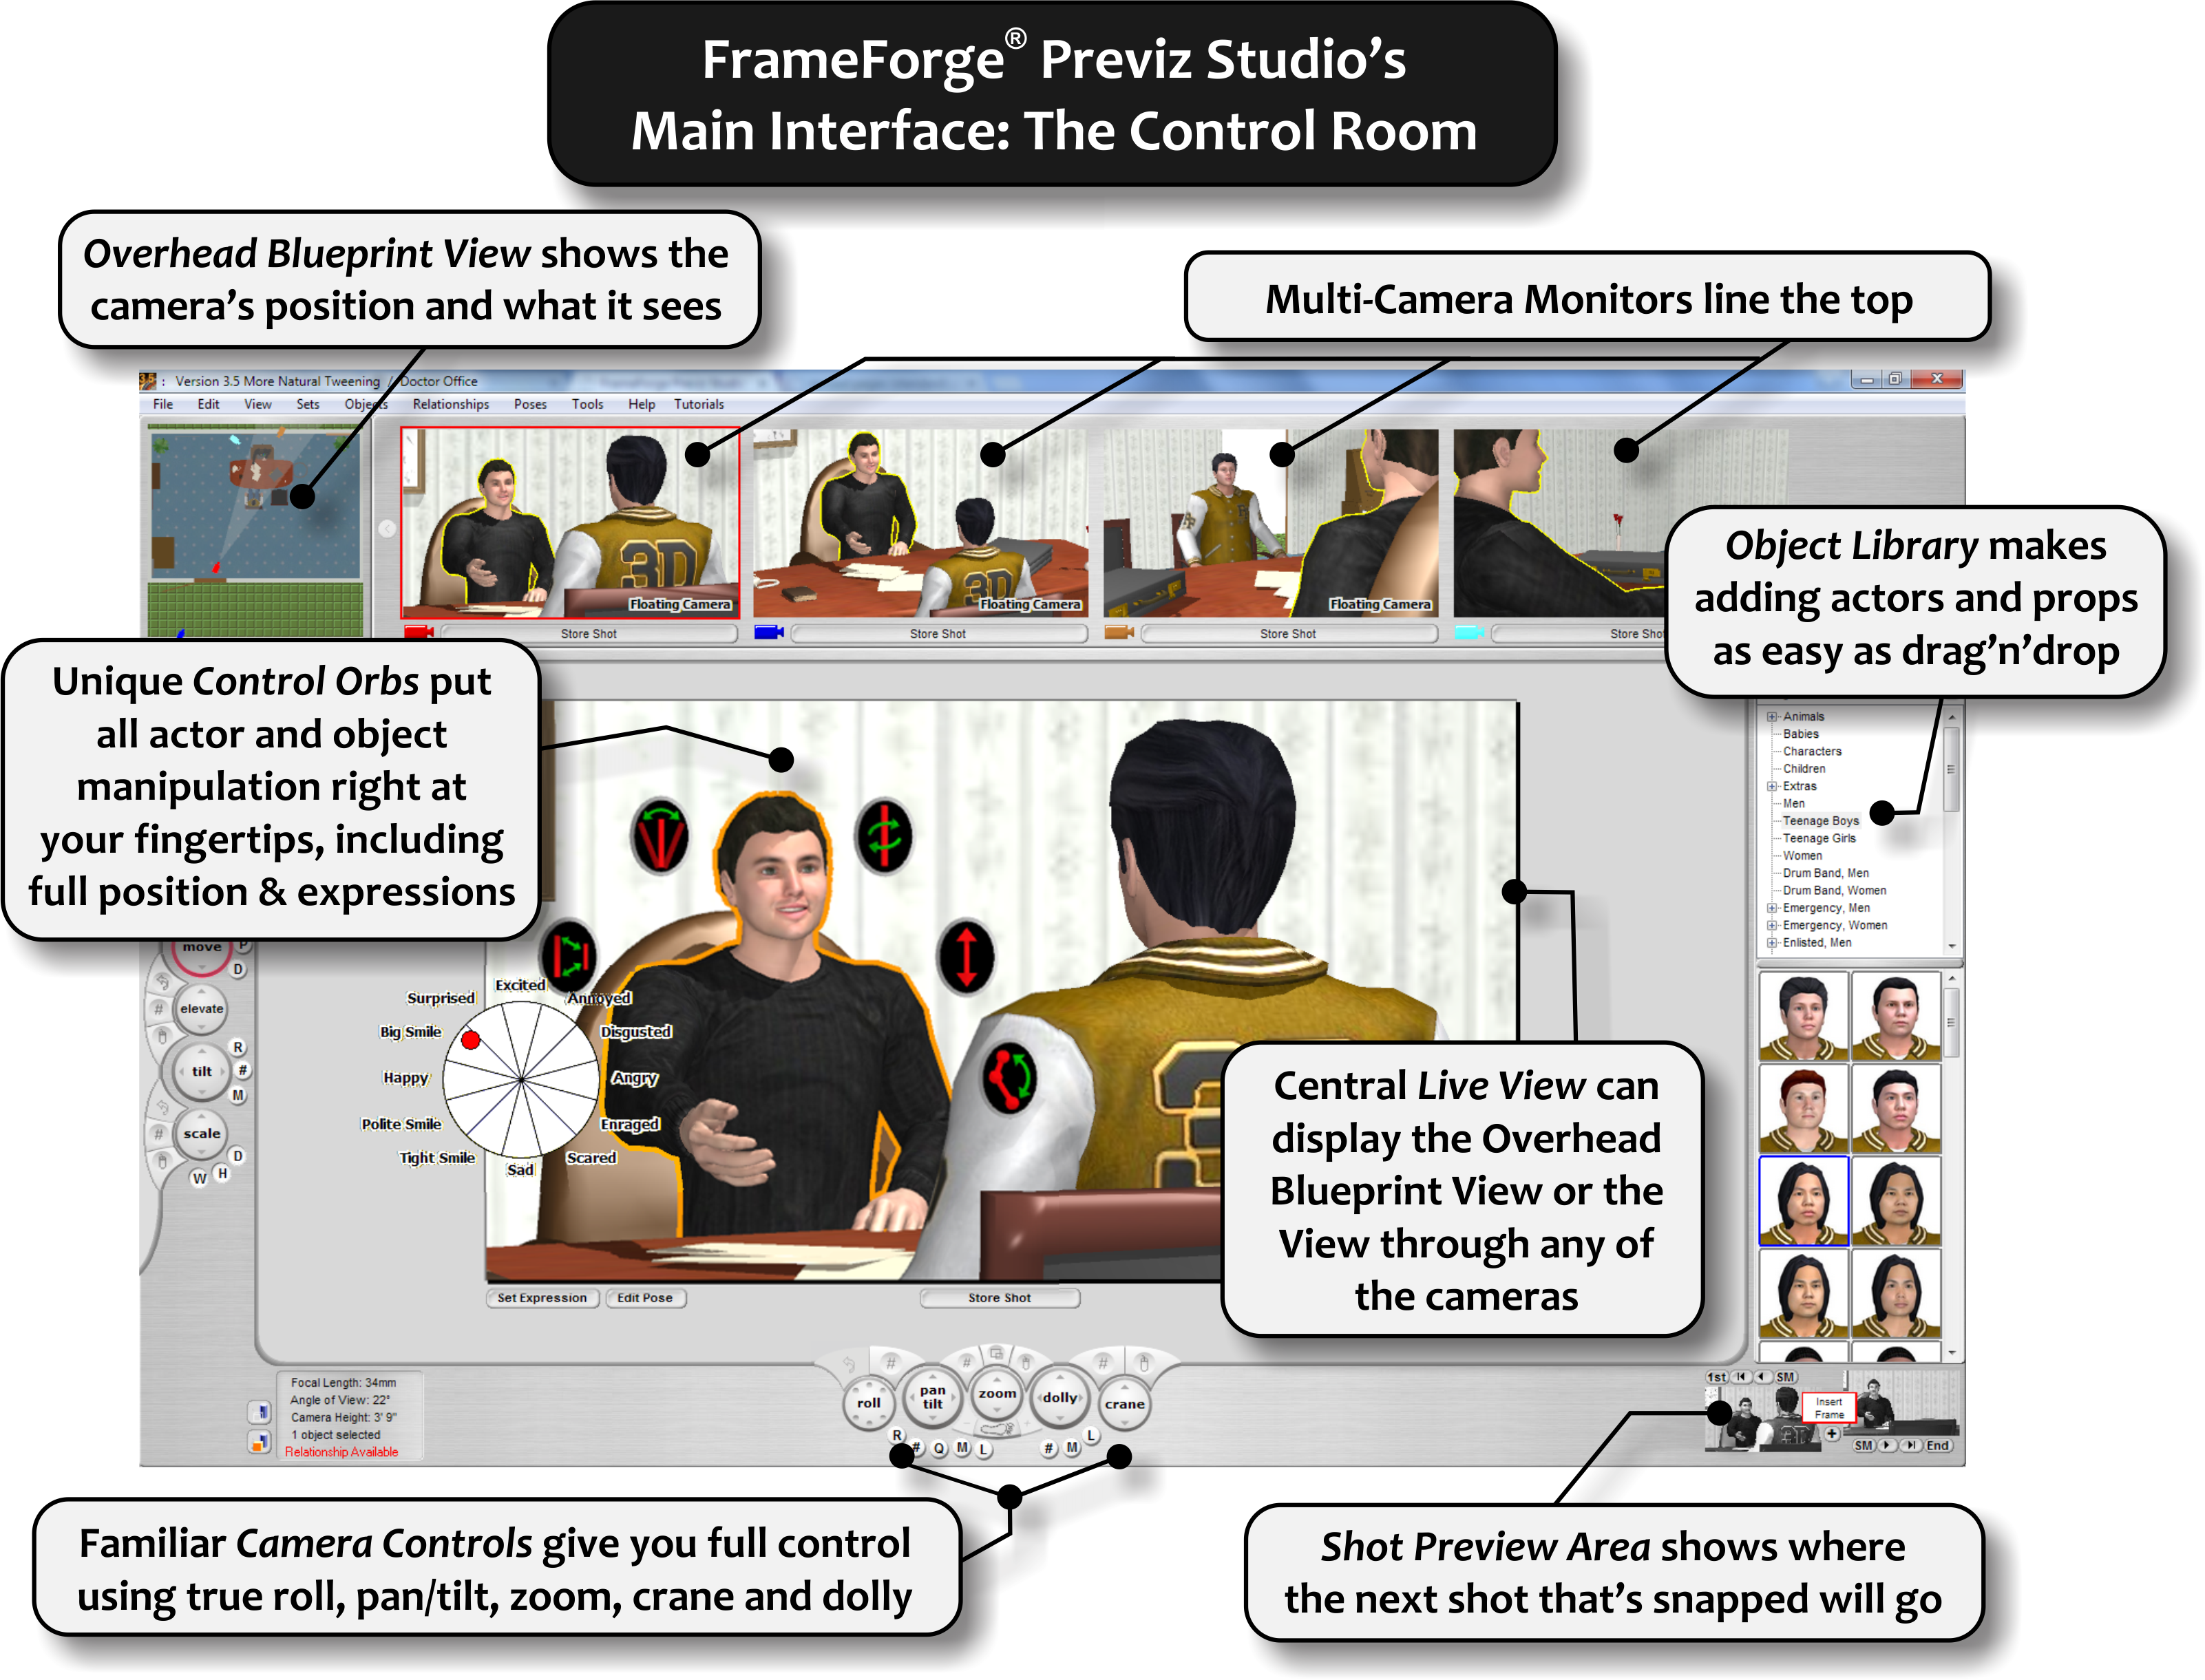 Innoventive Software Receives an Emmy® for FrameForge Previz Studio ...